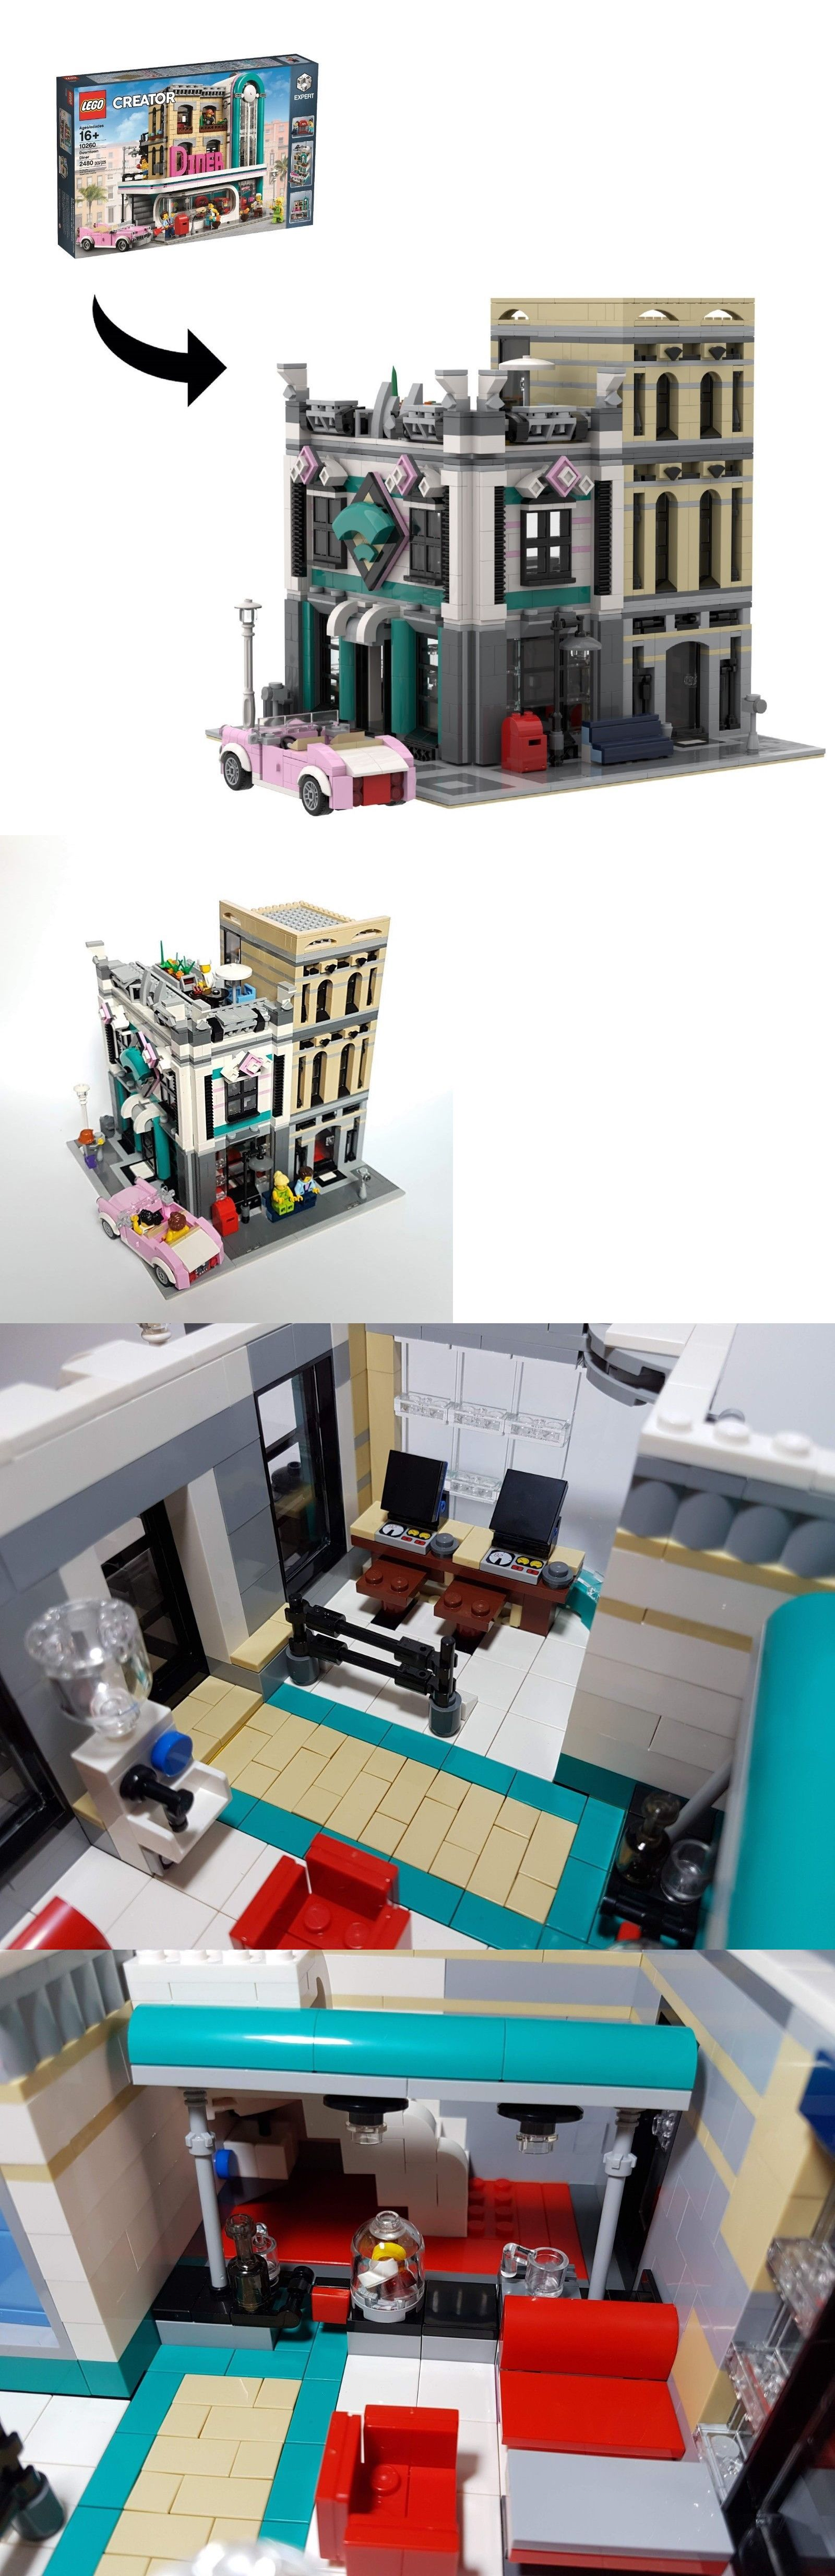 LEGO Instruction Manuals 183449: Instructions For Internet Café - An